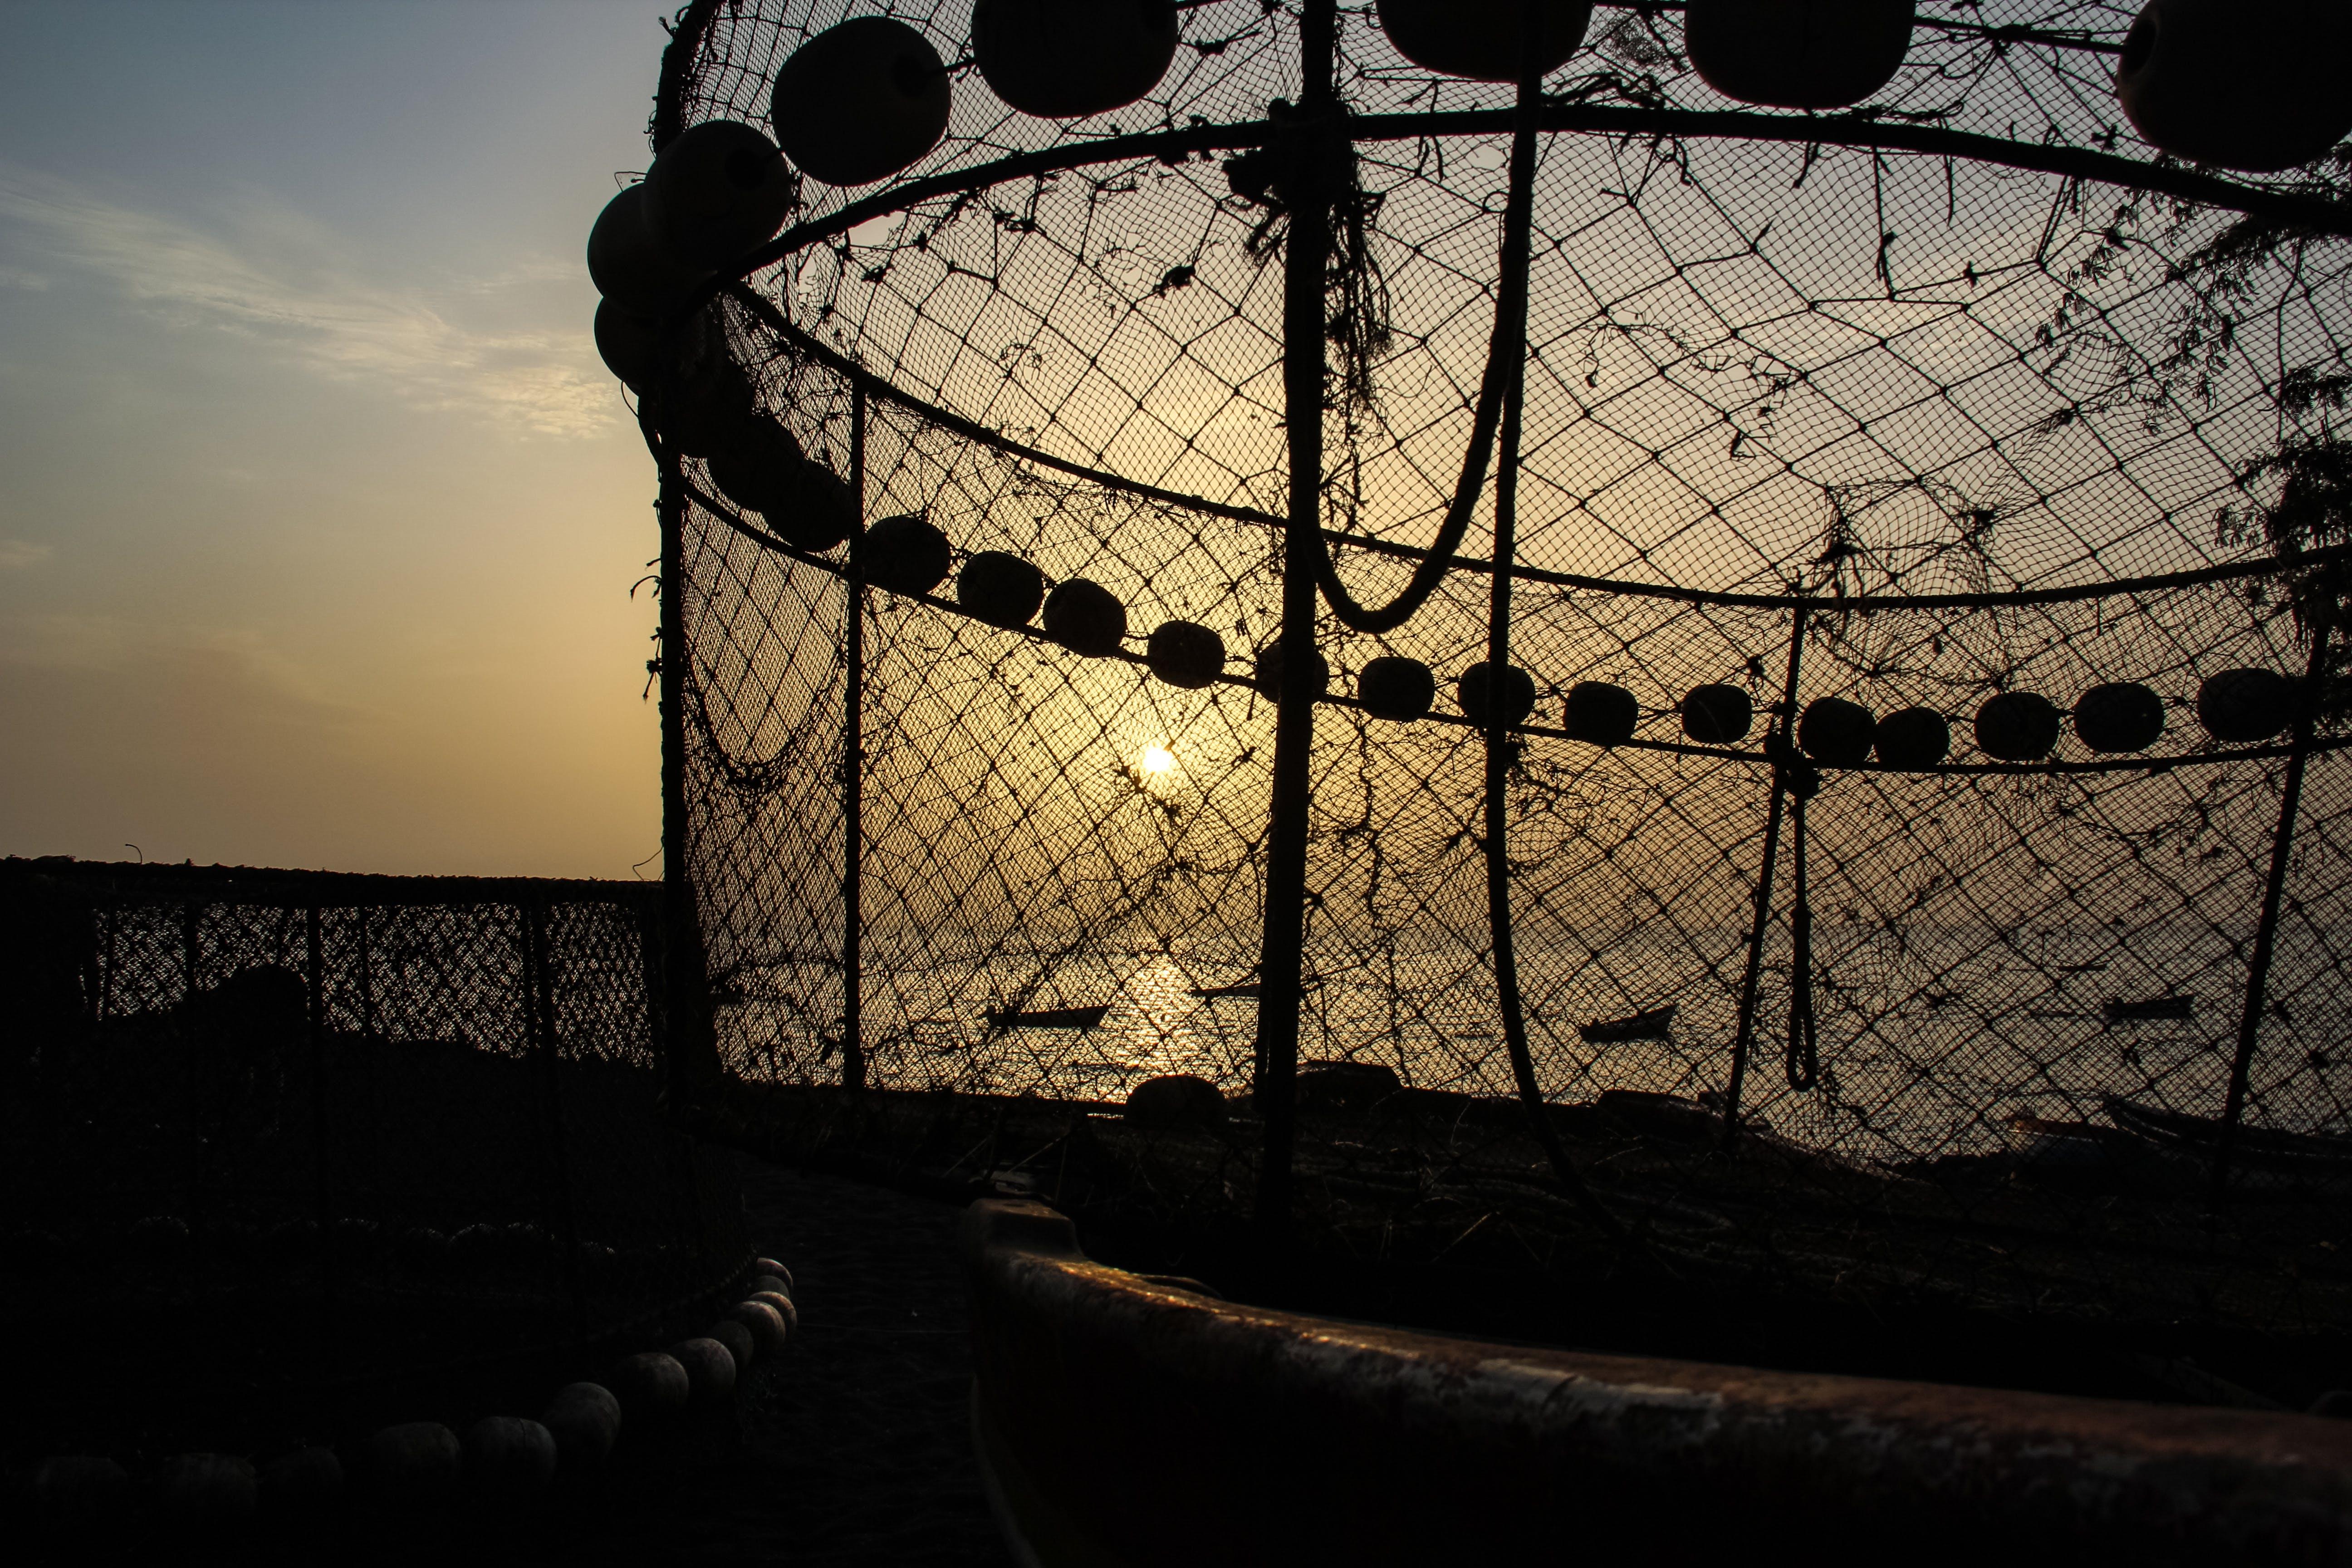 Free stock photo of fishing net